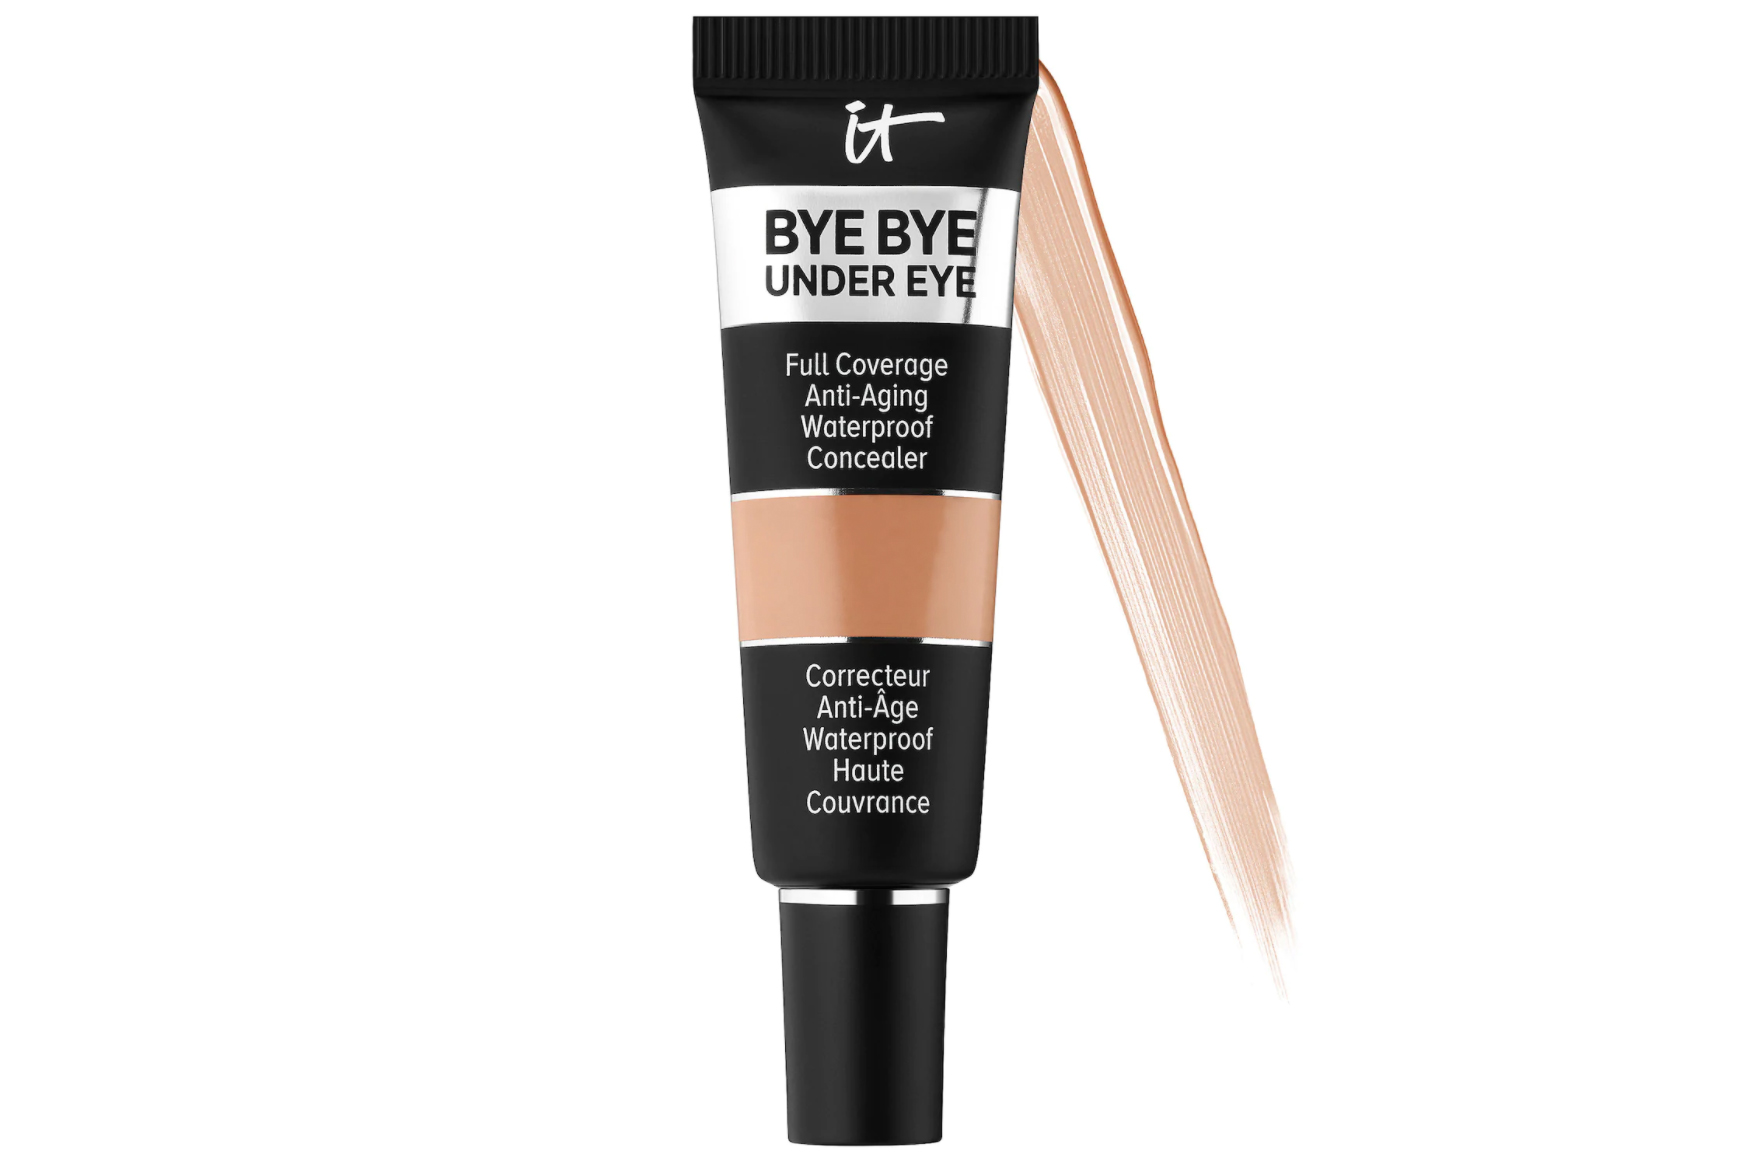 sweat-proof makeup concealer it cosmetics bye bye under eye